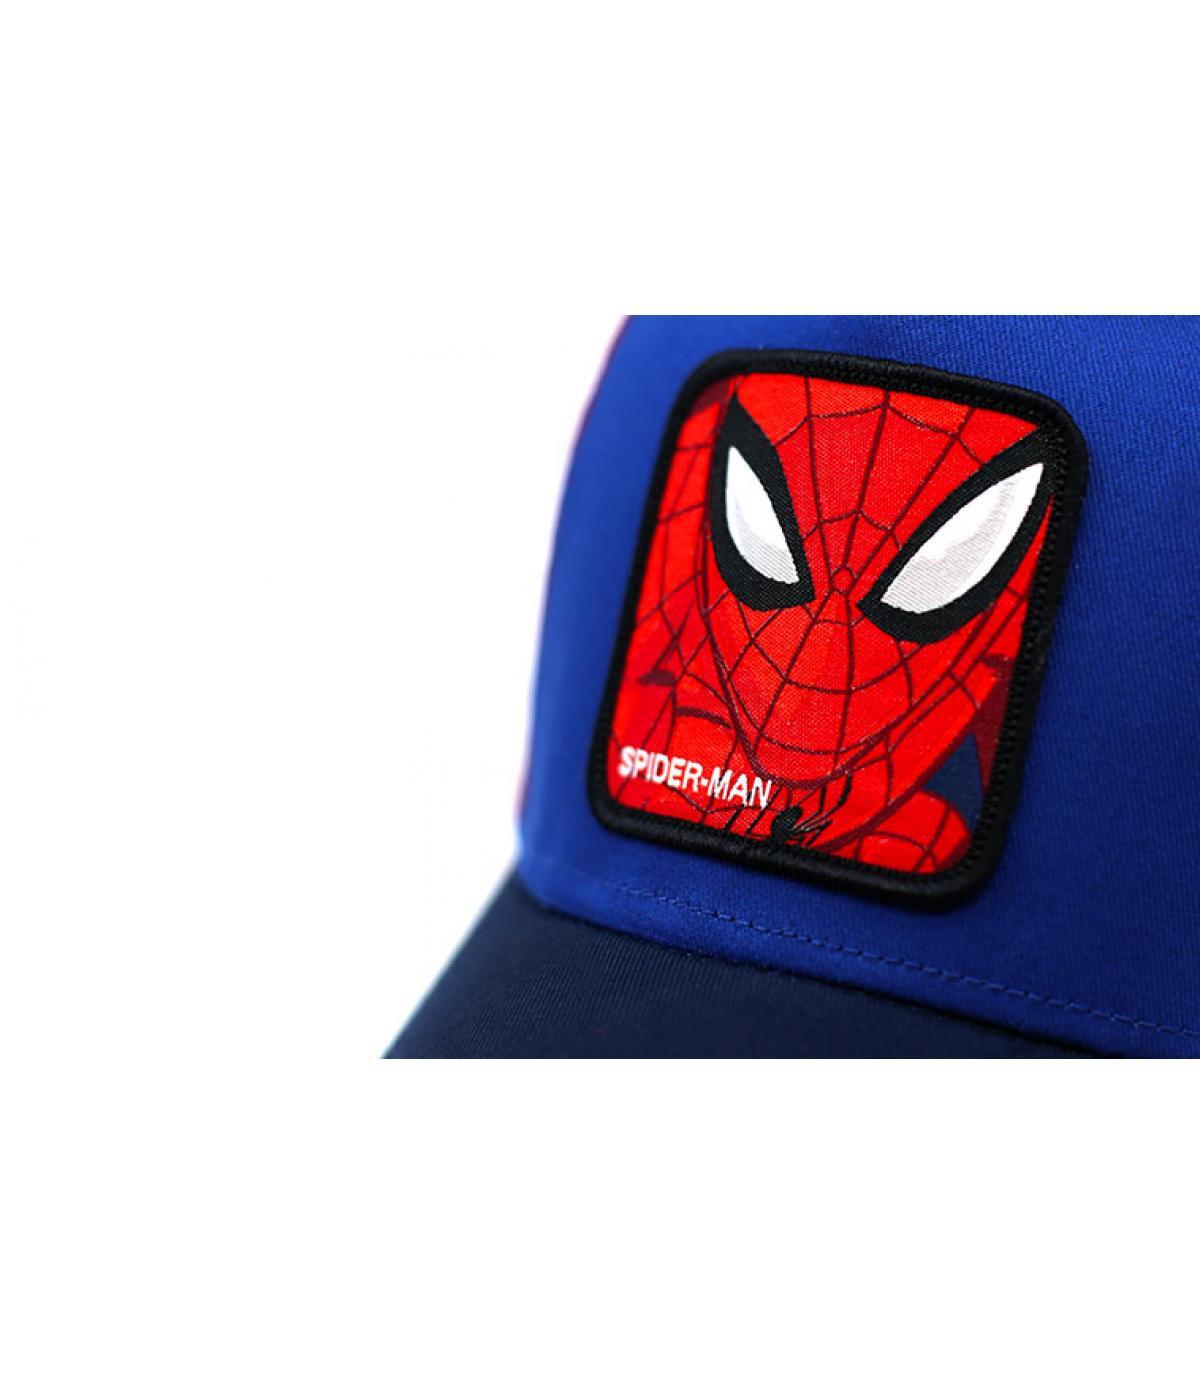 Dettagli Trucker Spiderman - image 3